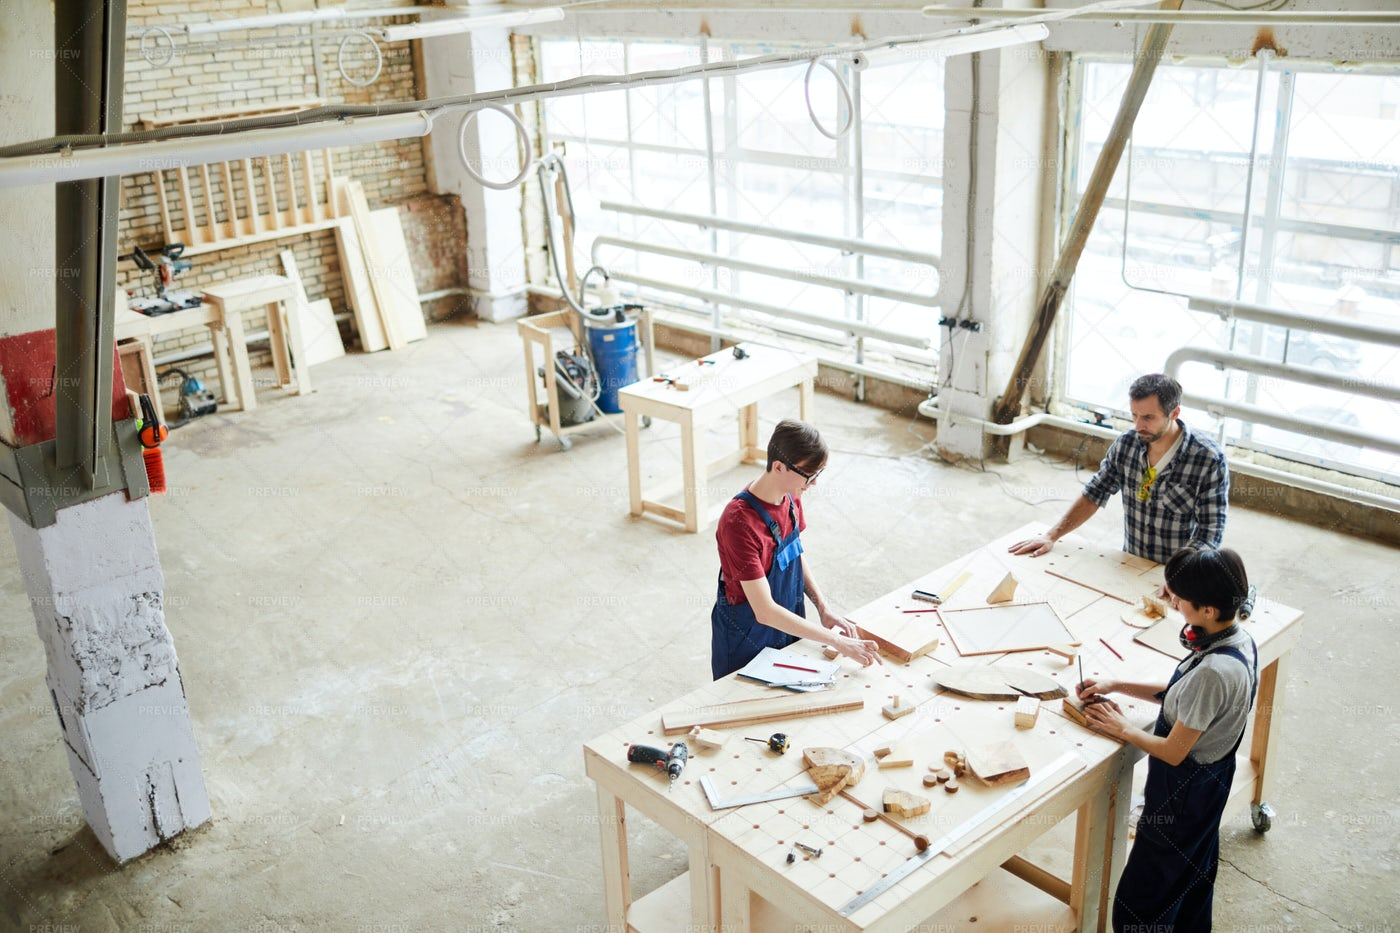 Workspace Of Carpenters: Stock Photos